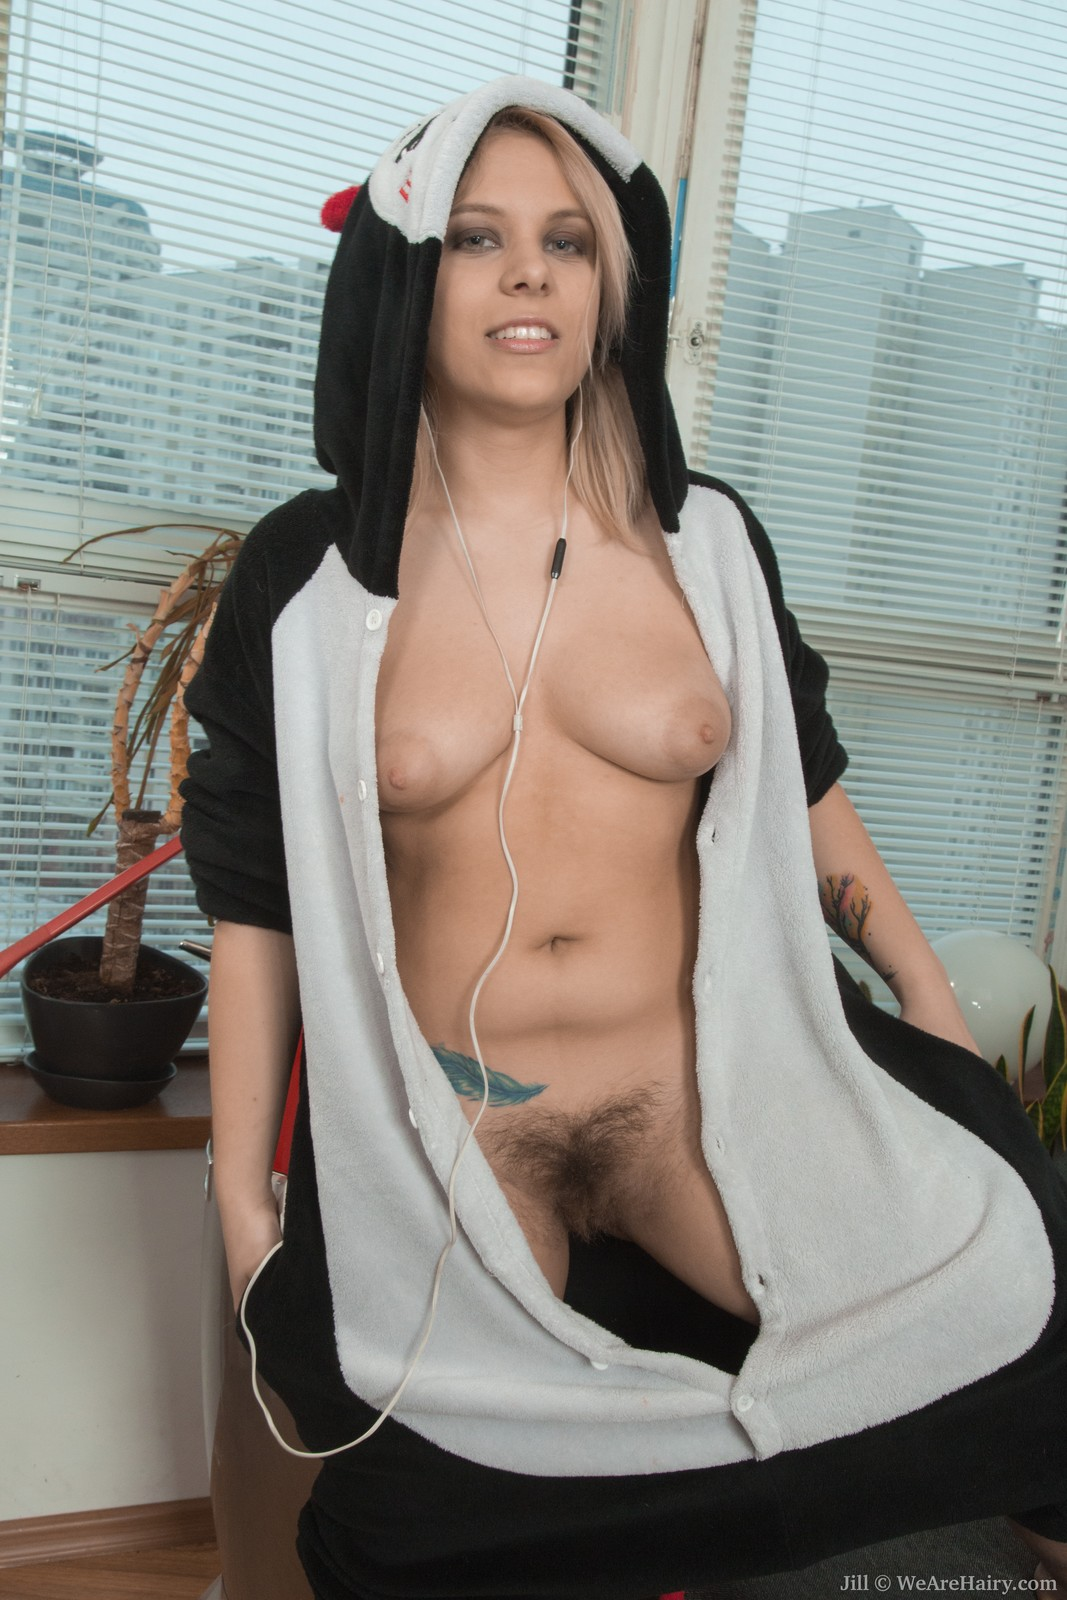 Sometimes hot russian girls topless